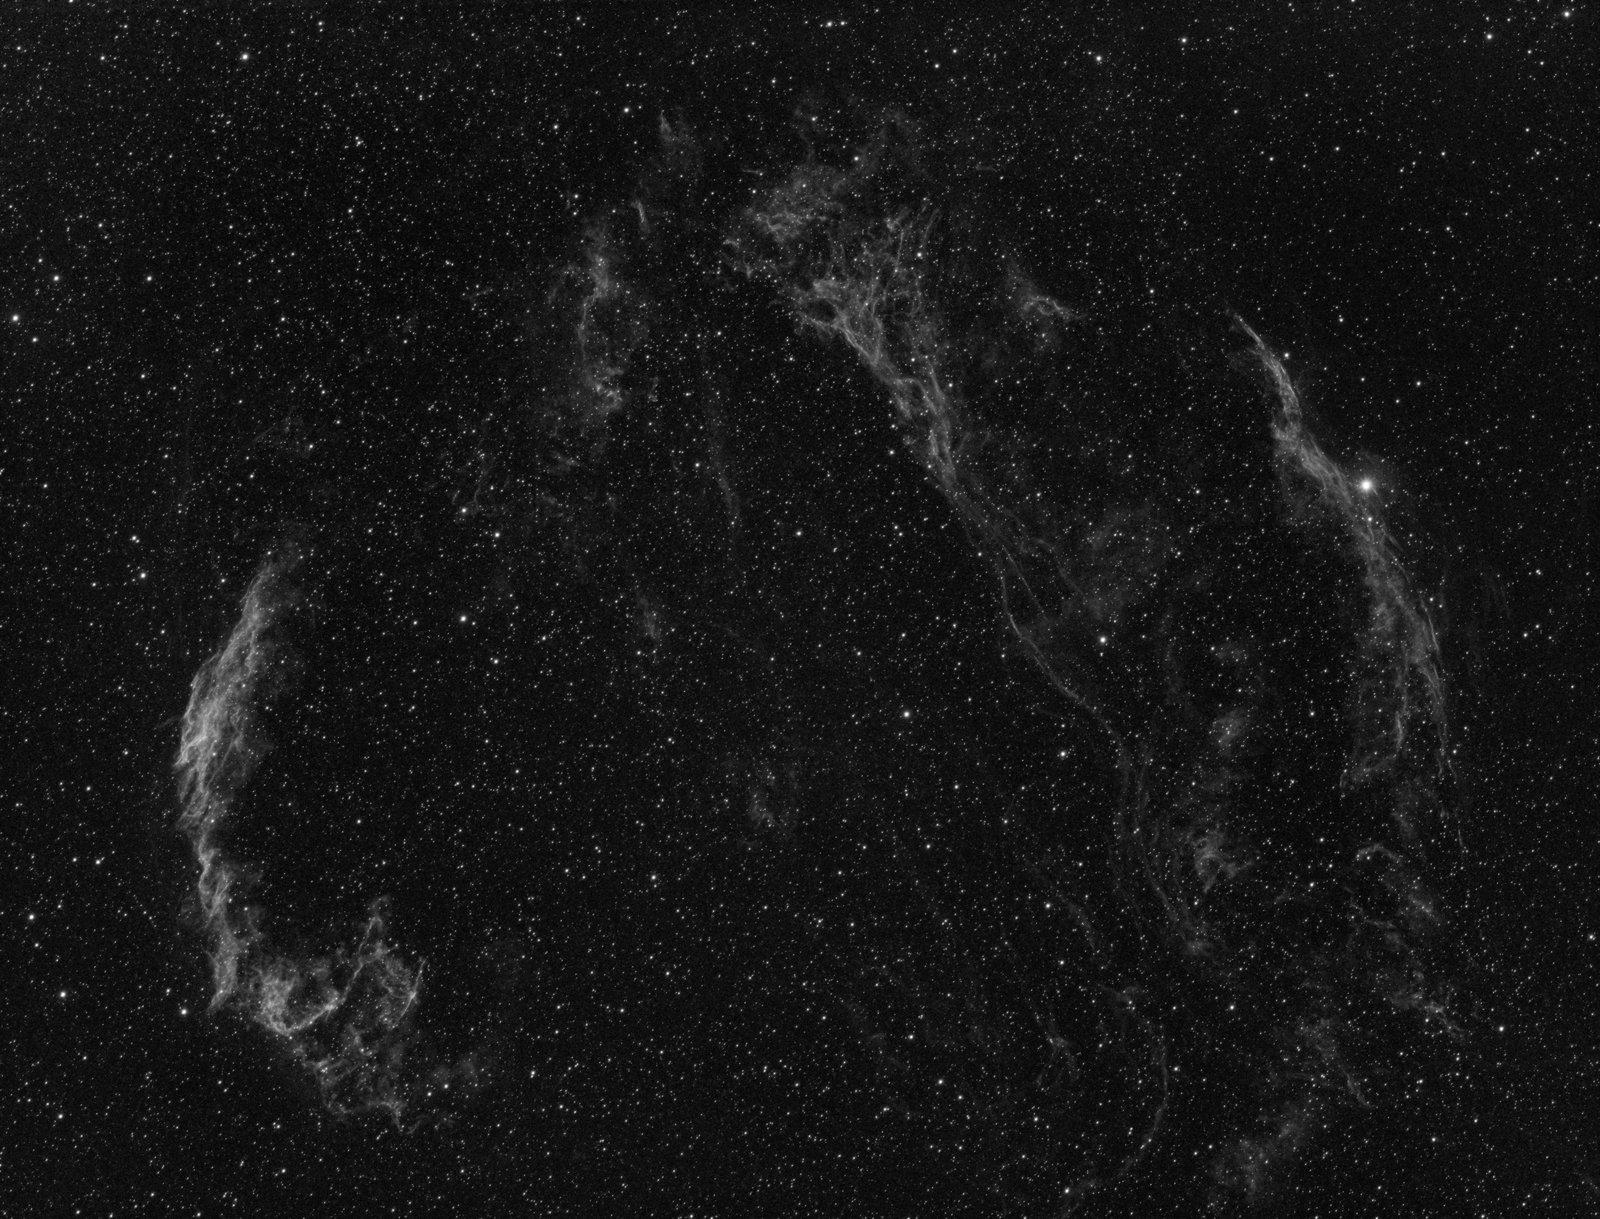 Copy-of-2VEIL_STARS_deconv-lpc-St.jpg